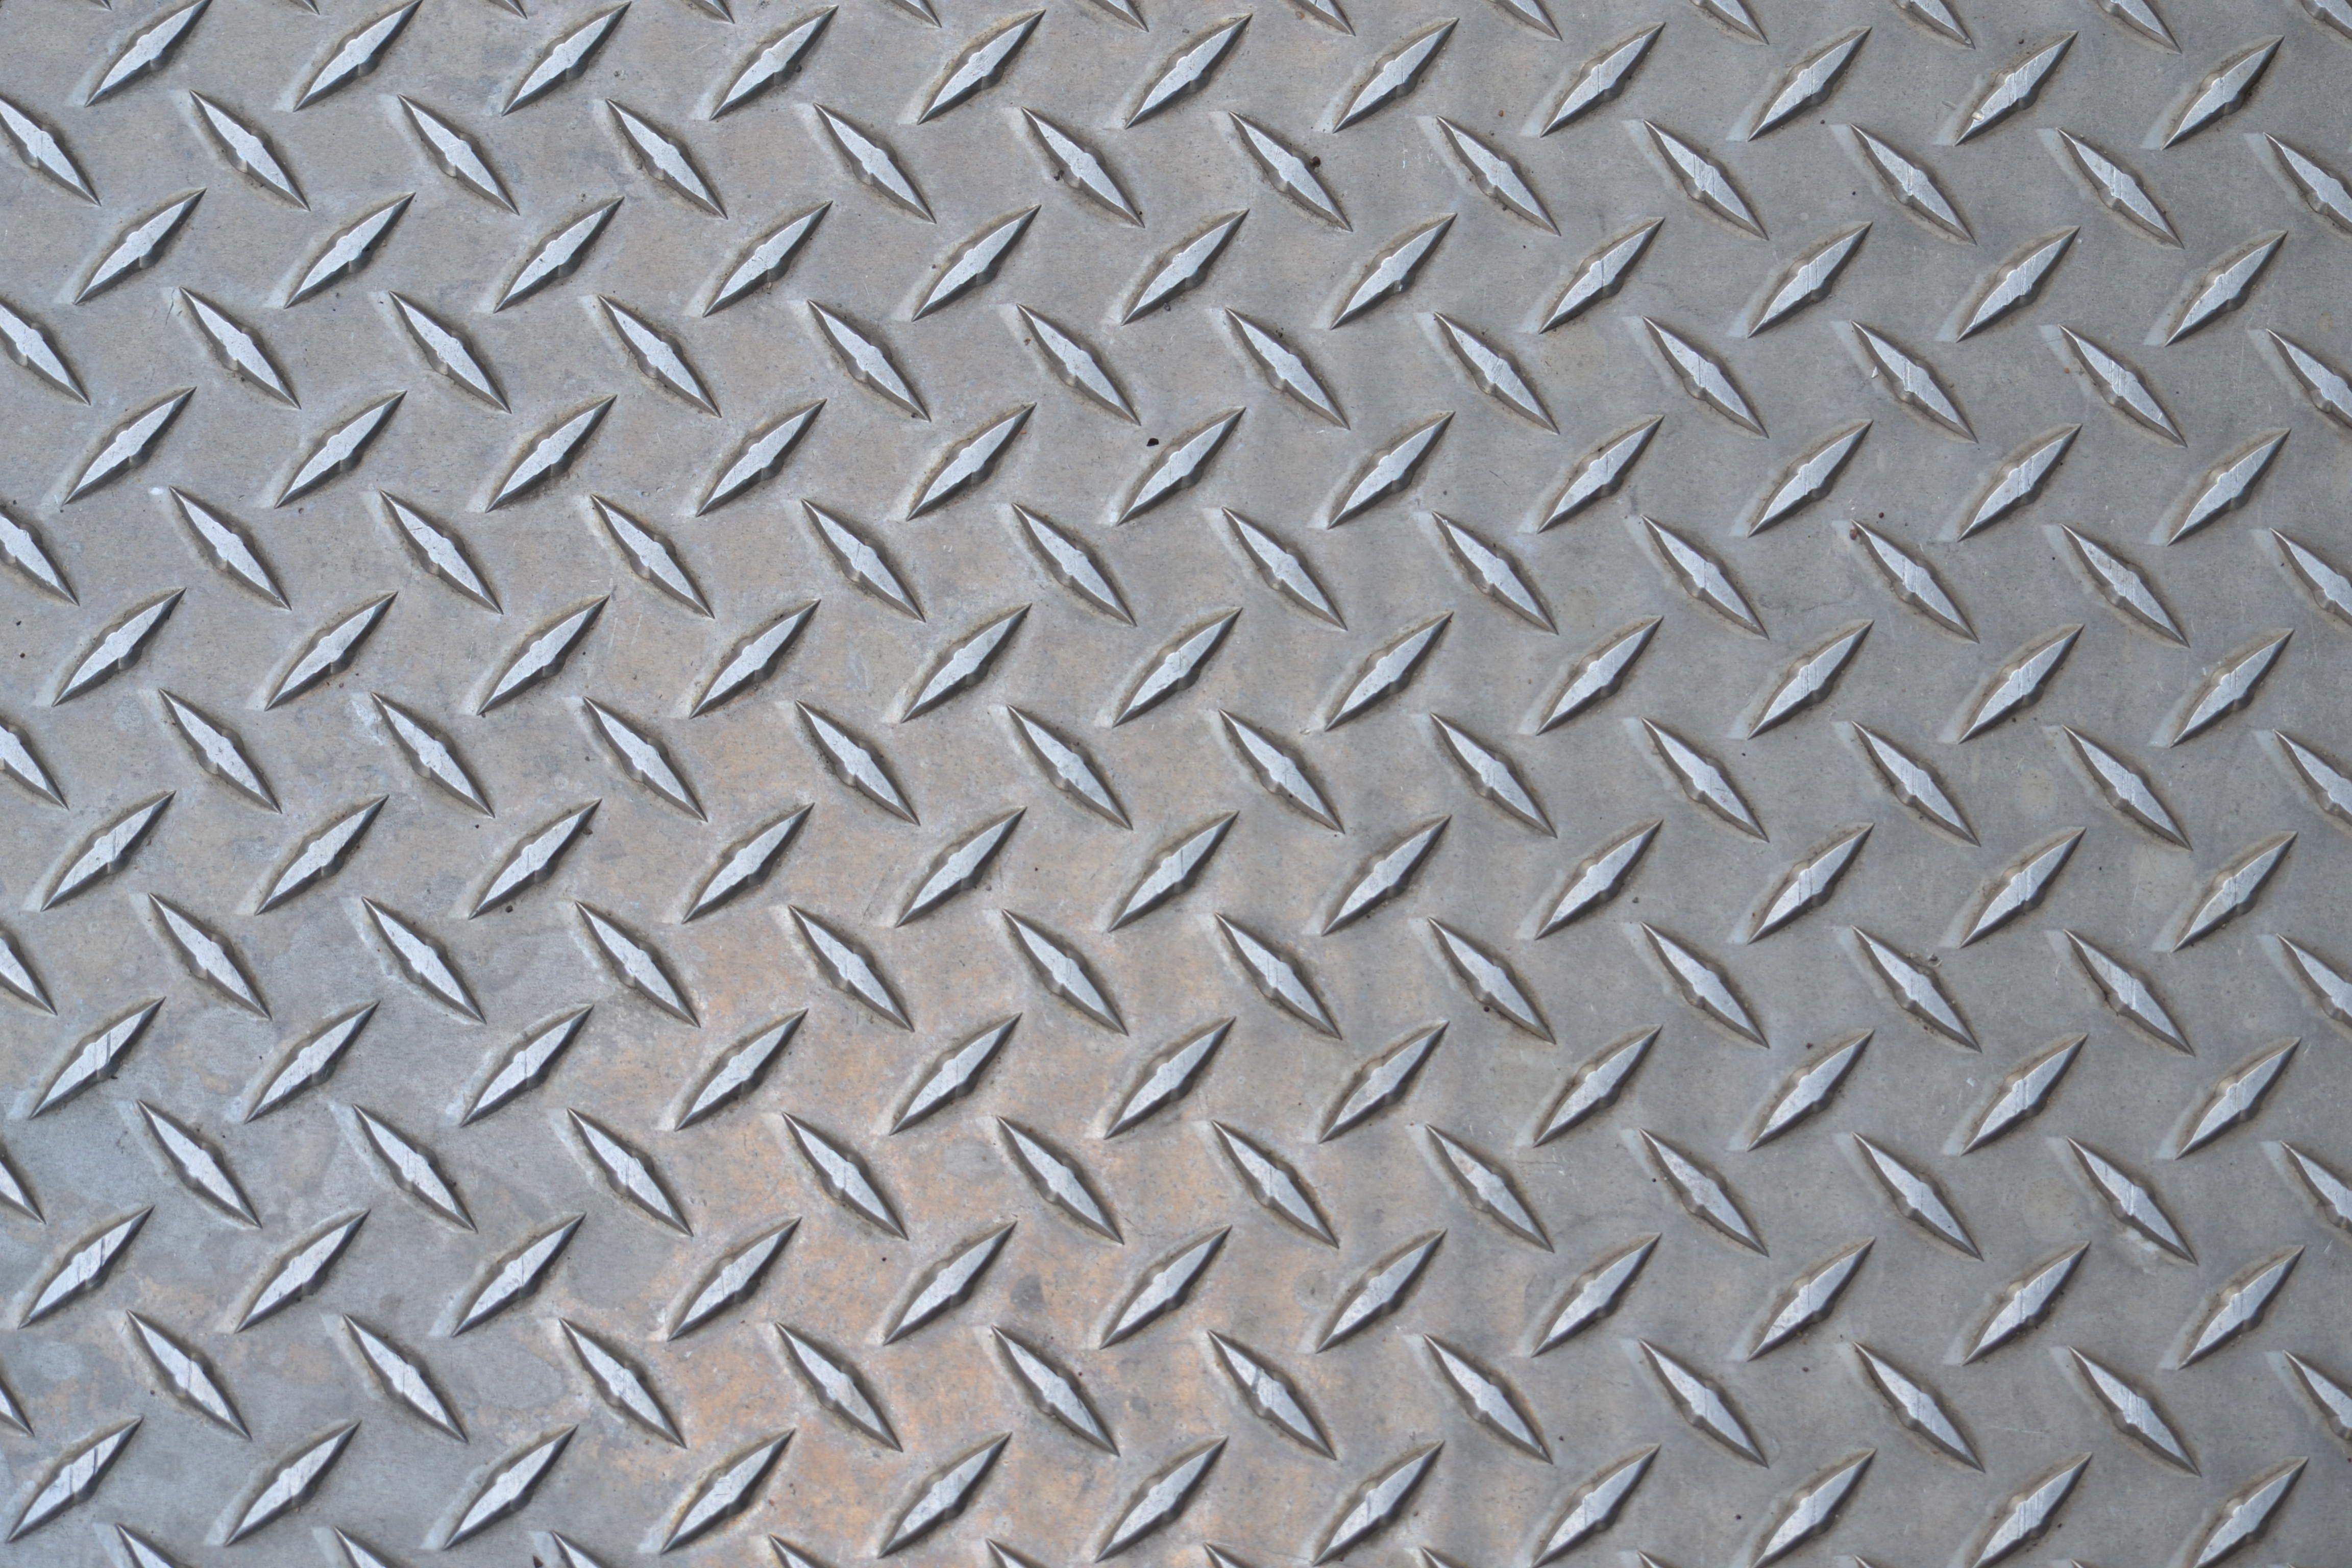 Pin By Vahid Zolfaghari On Holiday 17 Metal Texture Diamond Plate Digital Texture